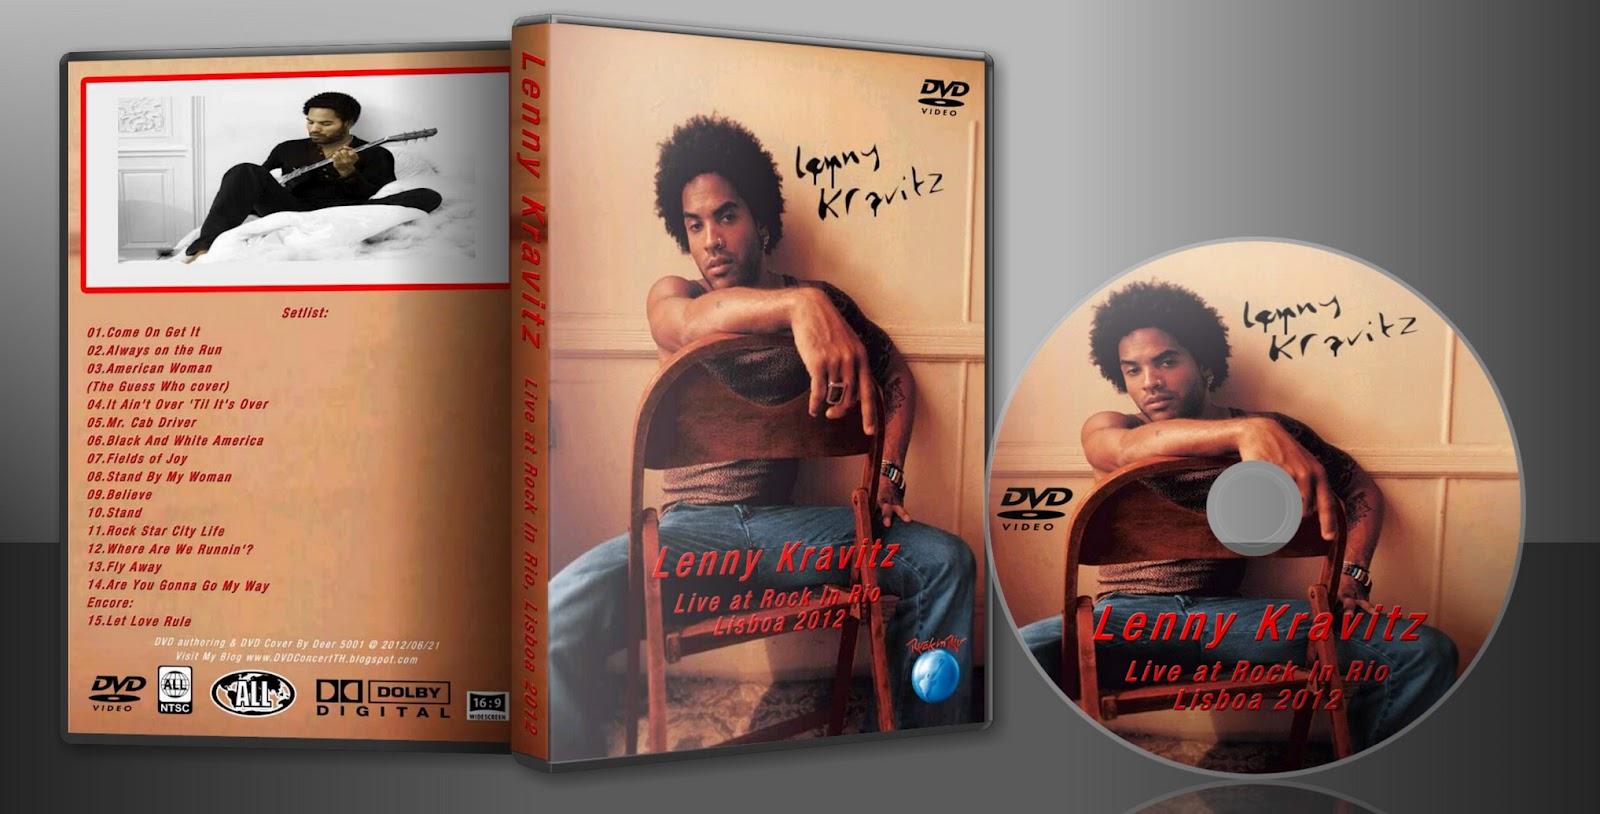 http://4.bp.blogspot.com/-t3gtH19MLfk/T-akV3iNV2I/AAAAAAAAGY8/Pgqcp70Qo98/s1600/DVD+Cover+For+Show+-+Lenny+Kravitz+-+2012+-+Rock+In+Rio+-+Lisbon.jpg